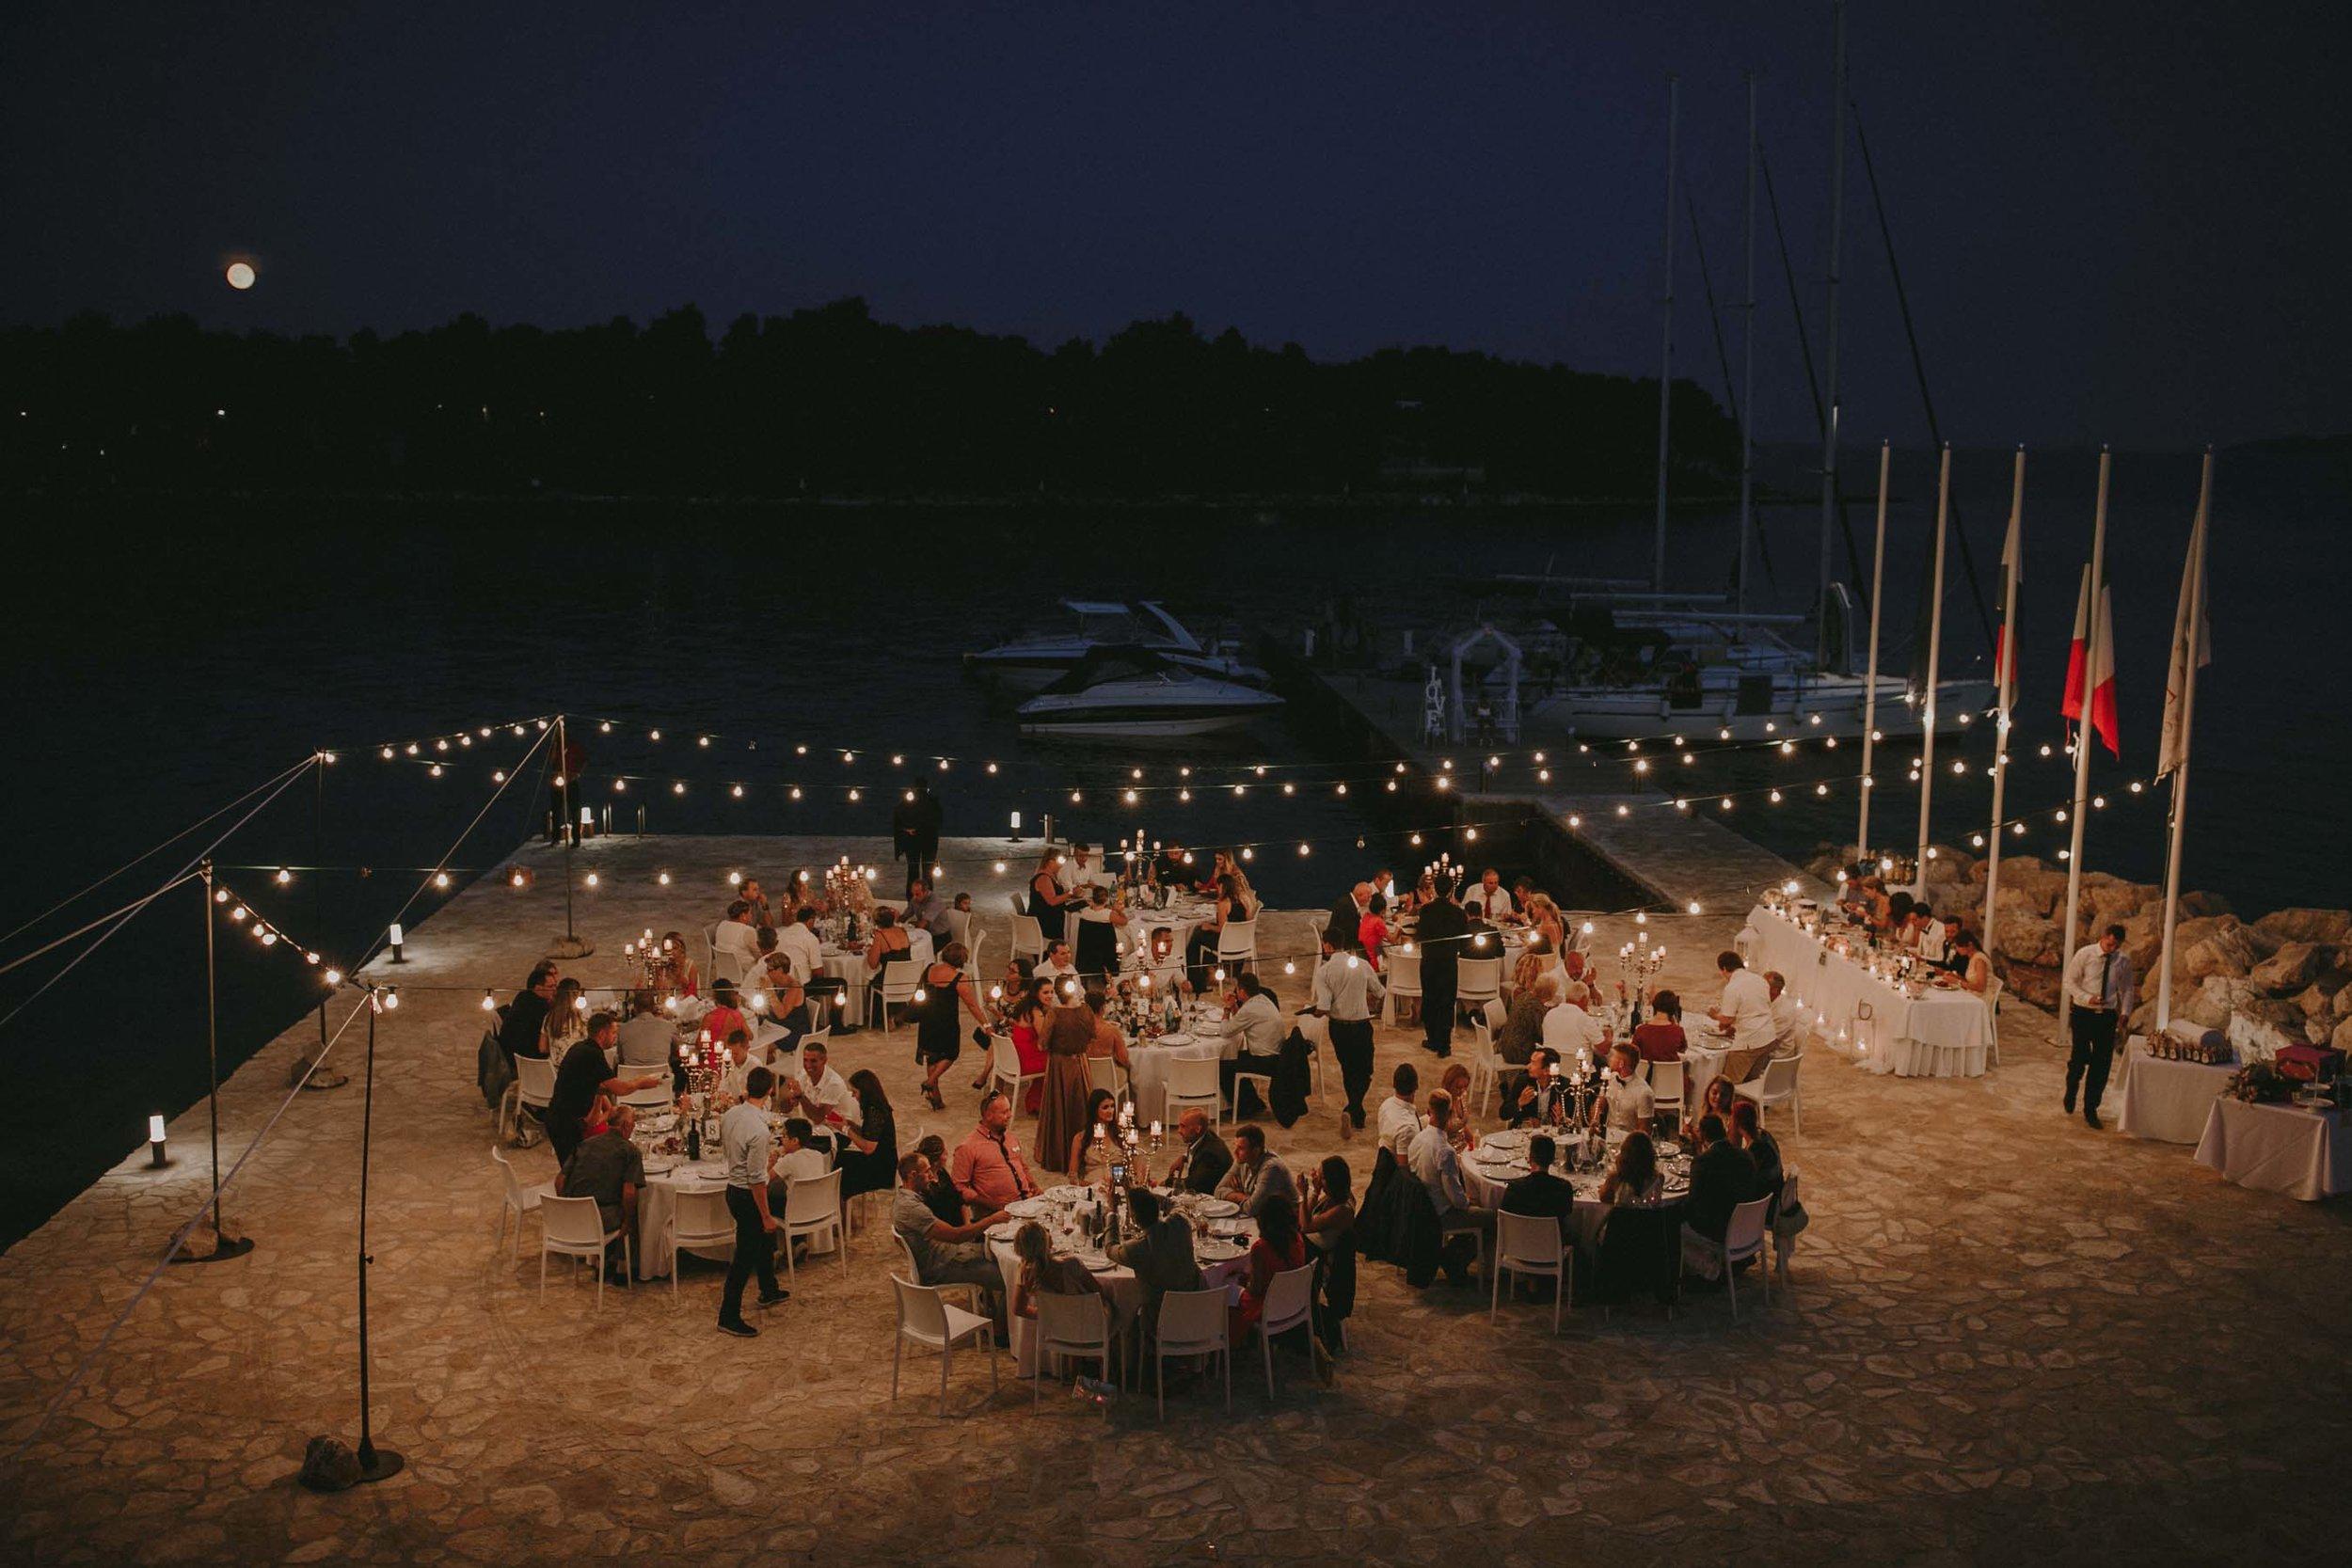 sylvia&dimitri-Wedding-Crvena_Luka-Croatia-90(9229).jpg